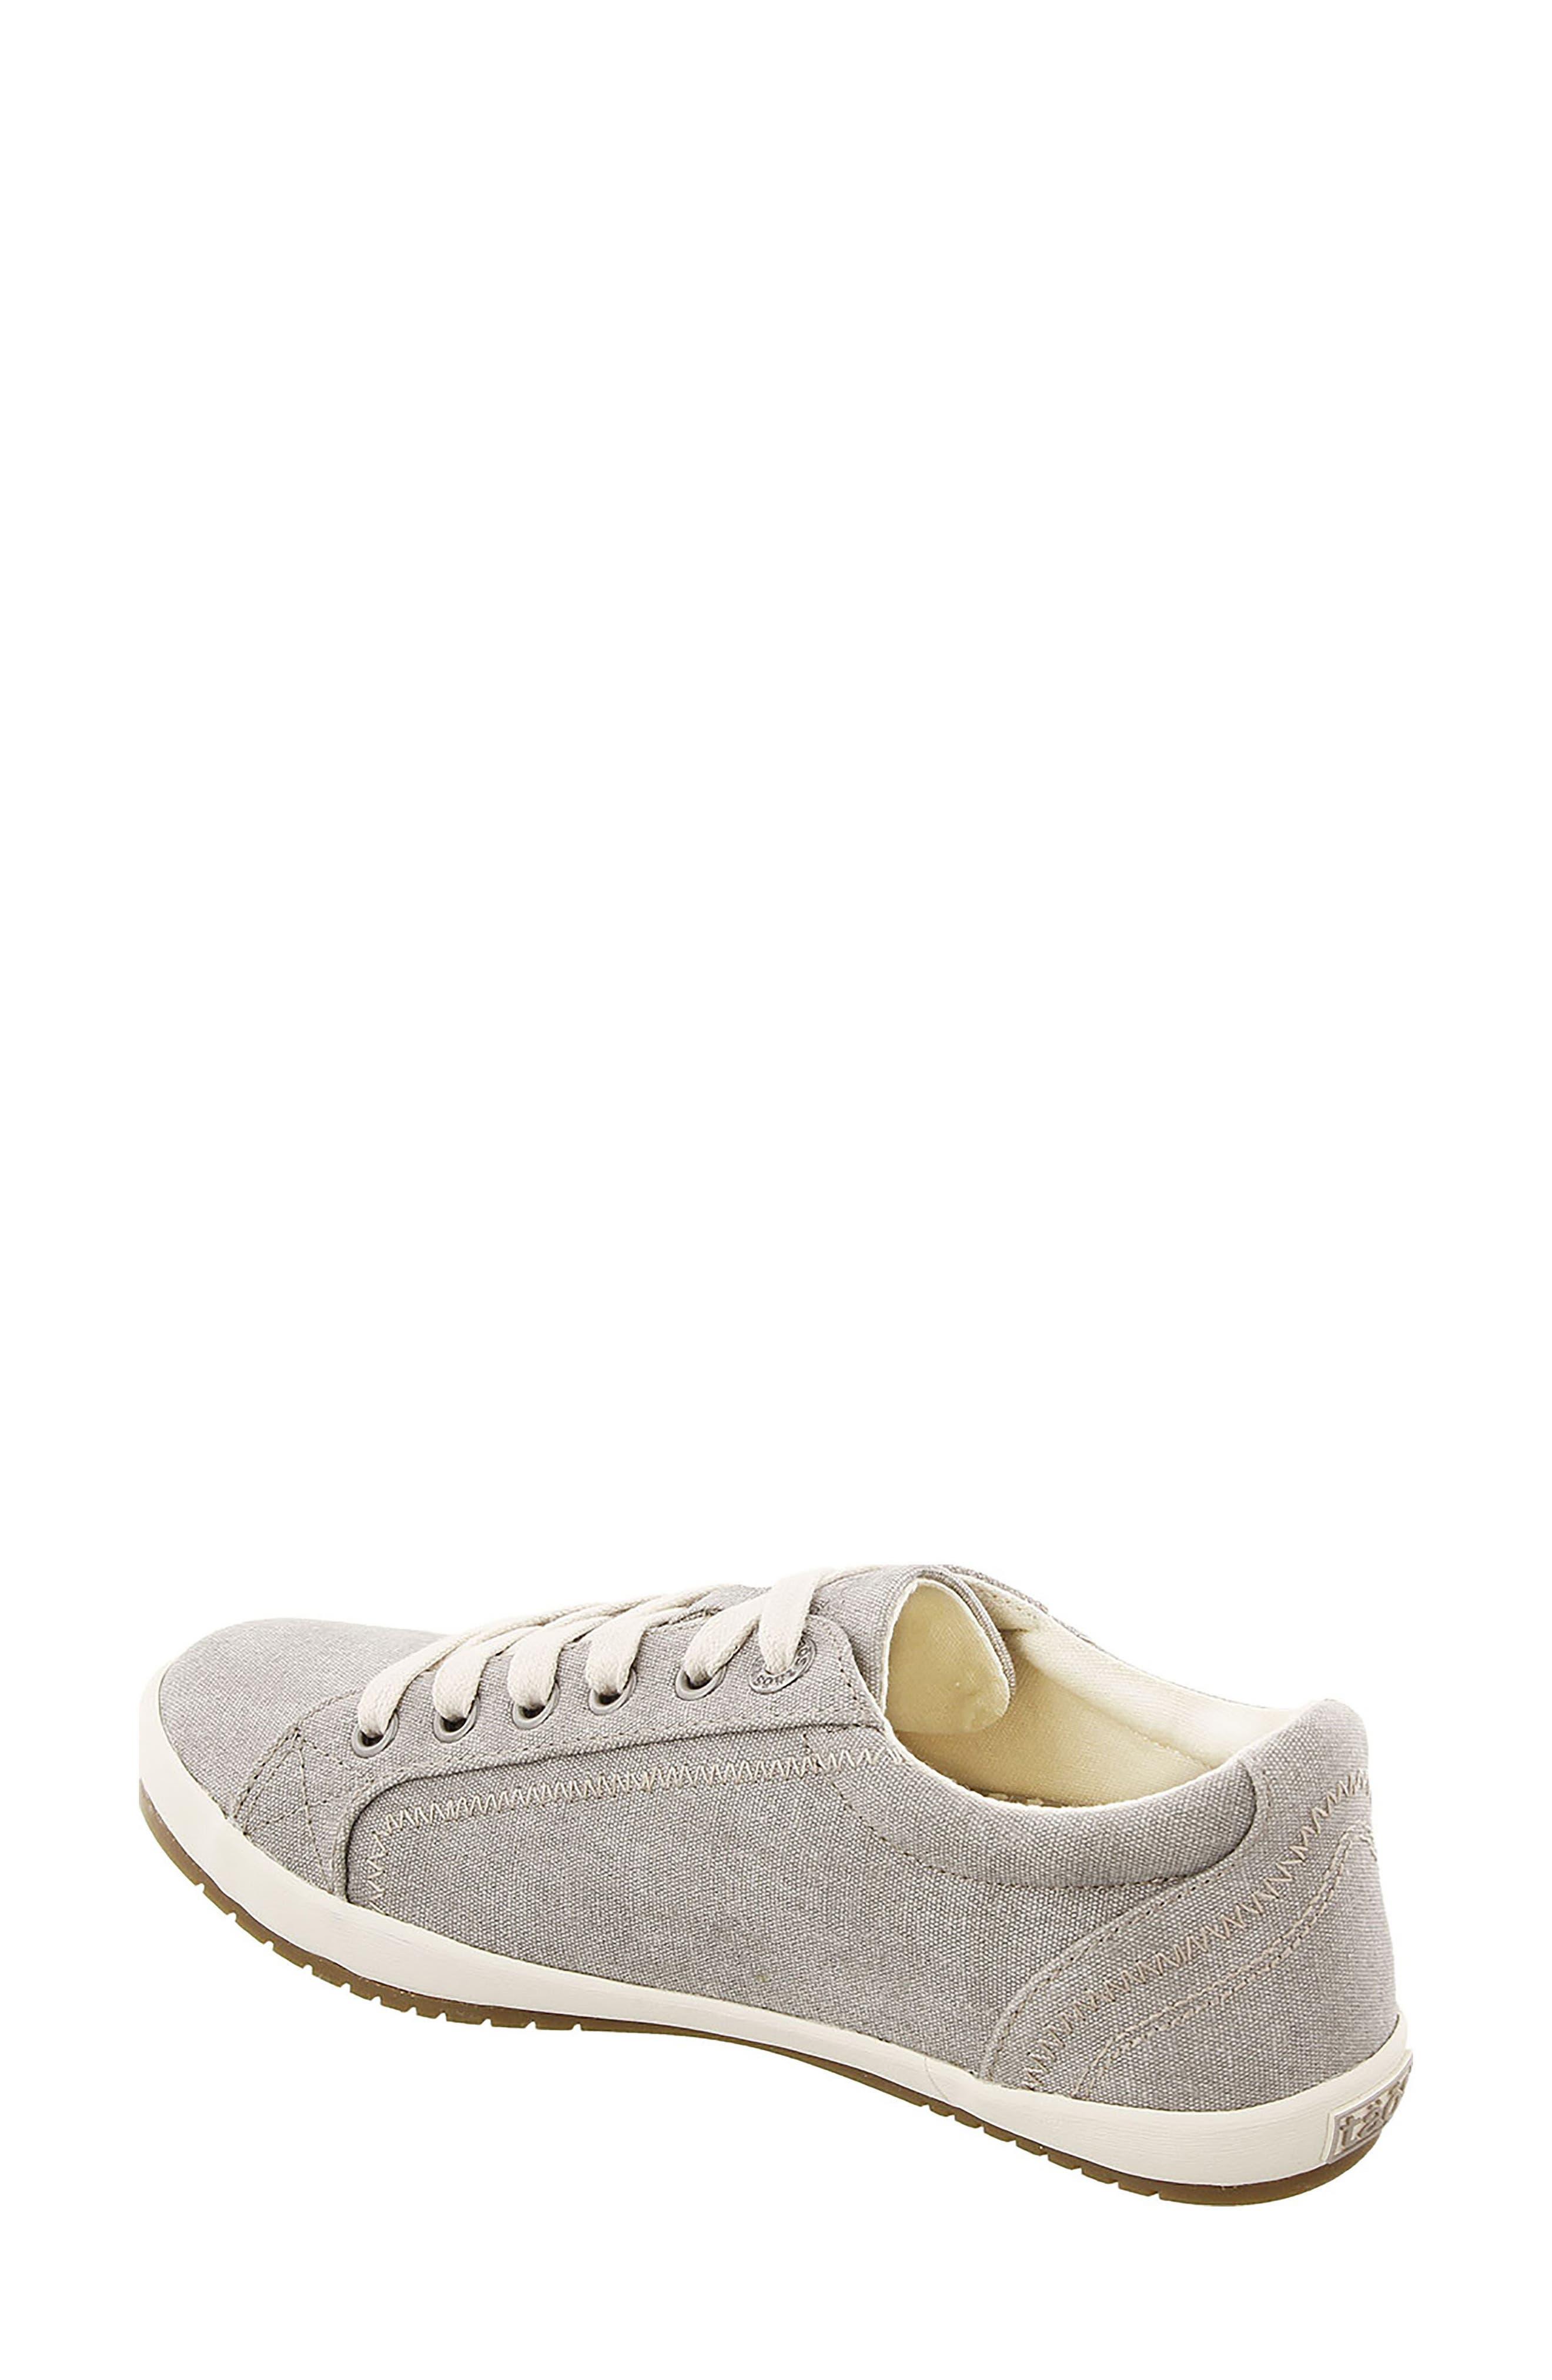 b3ff11234 Women s Taos Shoes